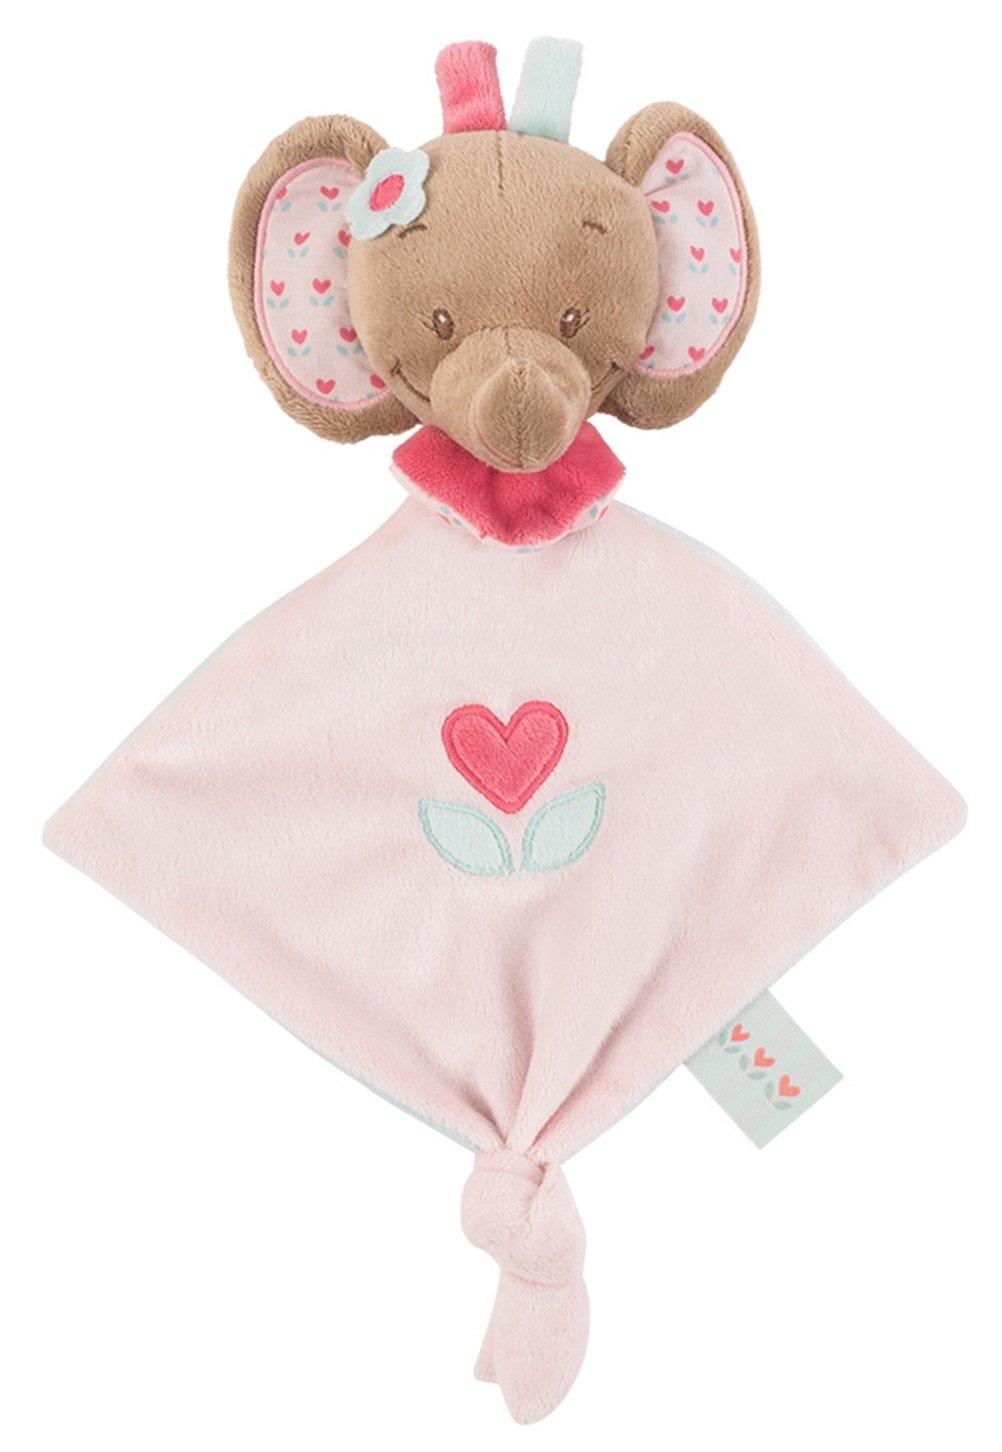 Nattou NA655101 - Set de regalos para recién nacidos